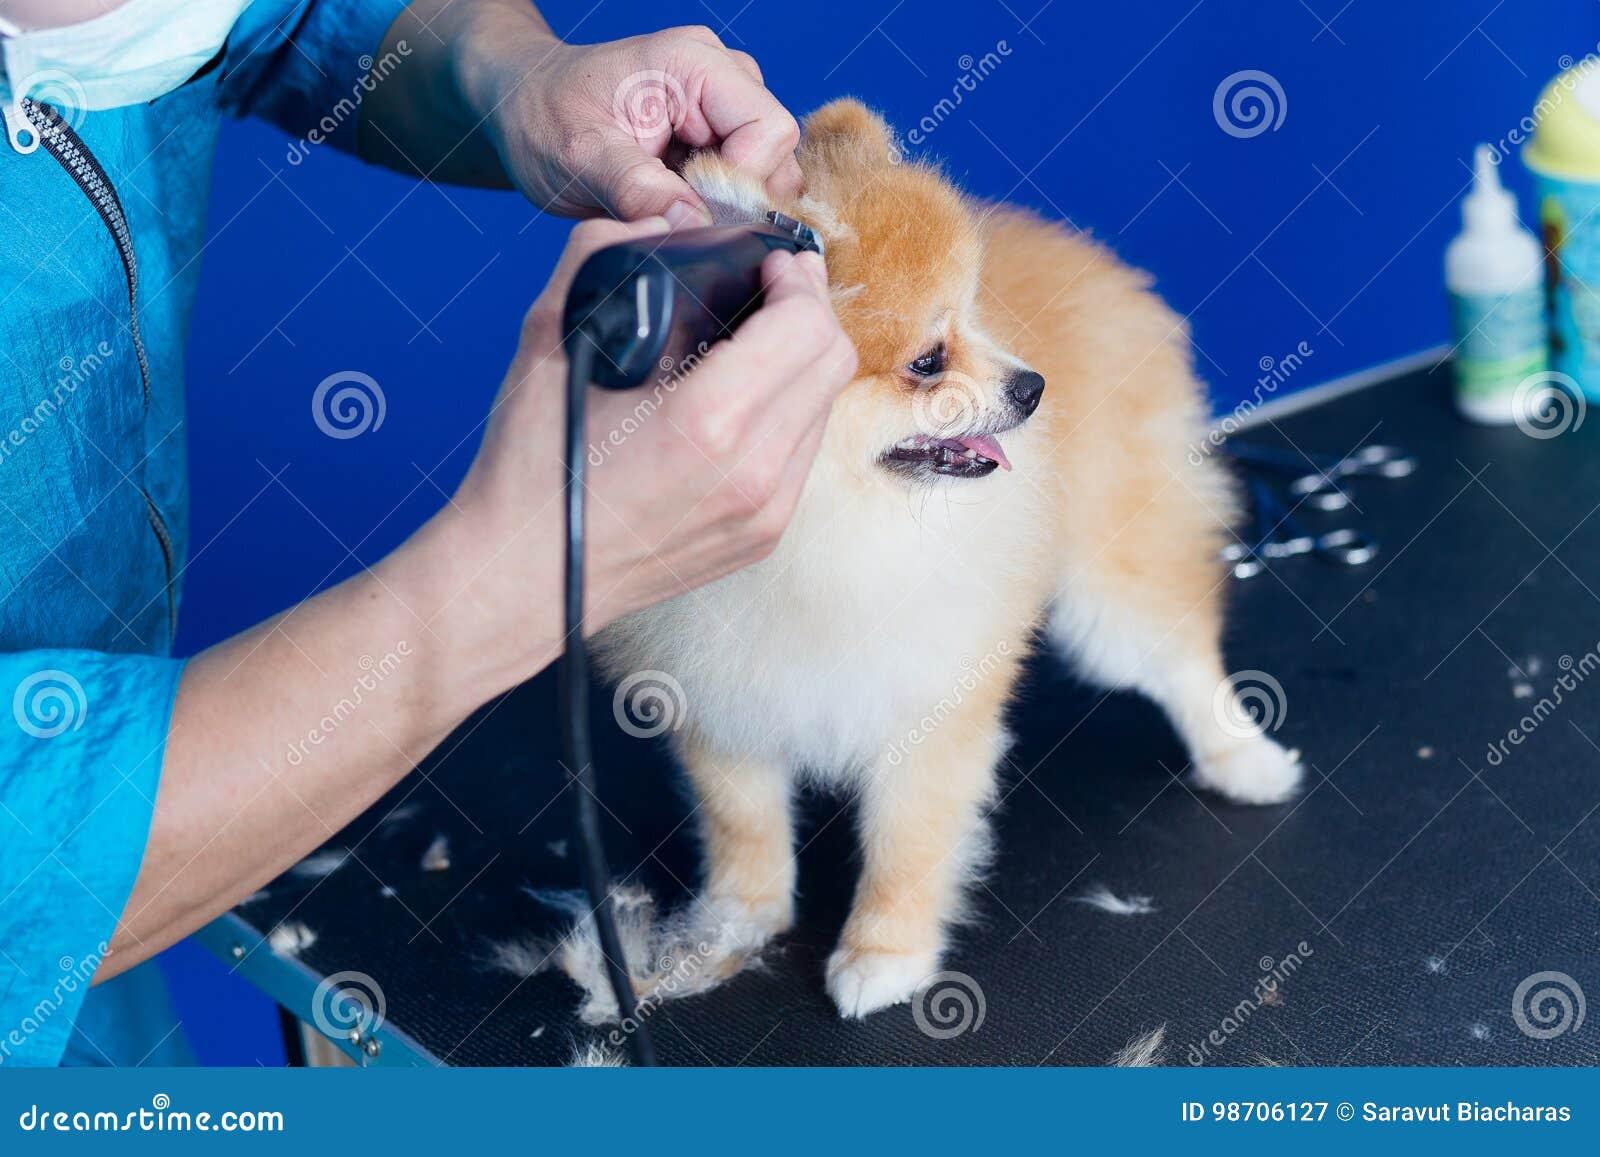 Groomer Haircut Cute Pomeranian In Hair Service Stock Image Image